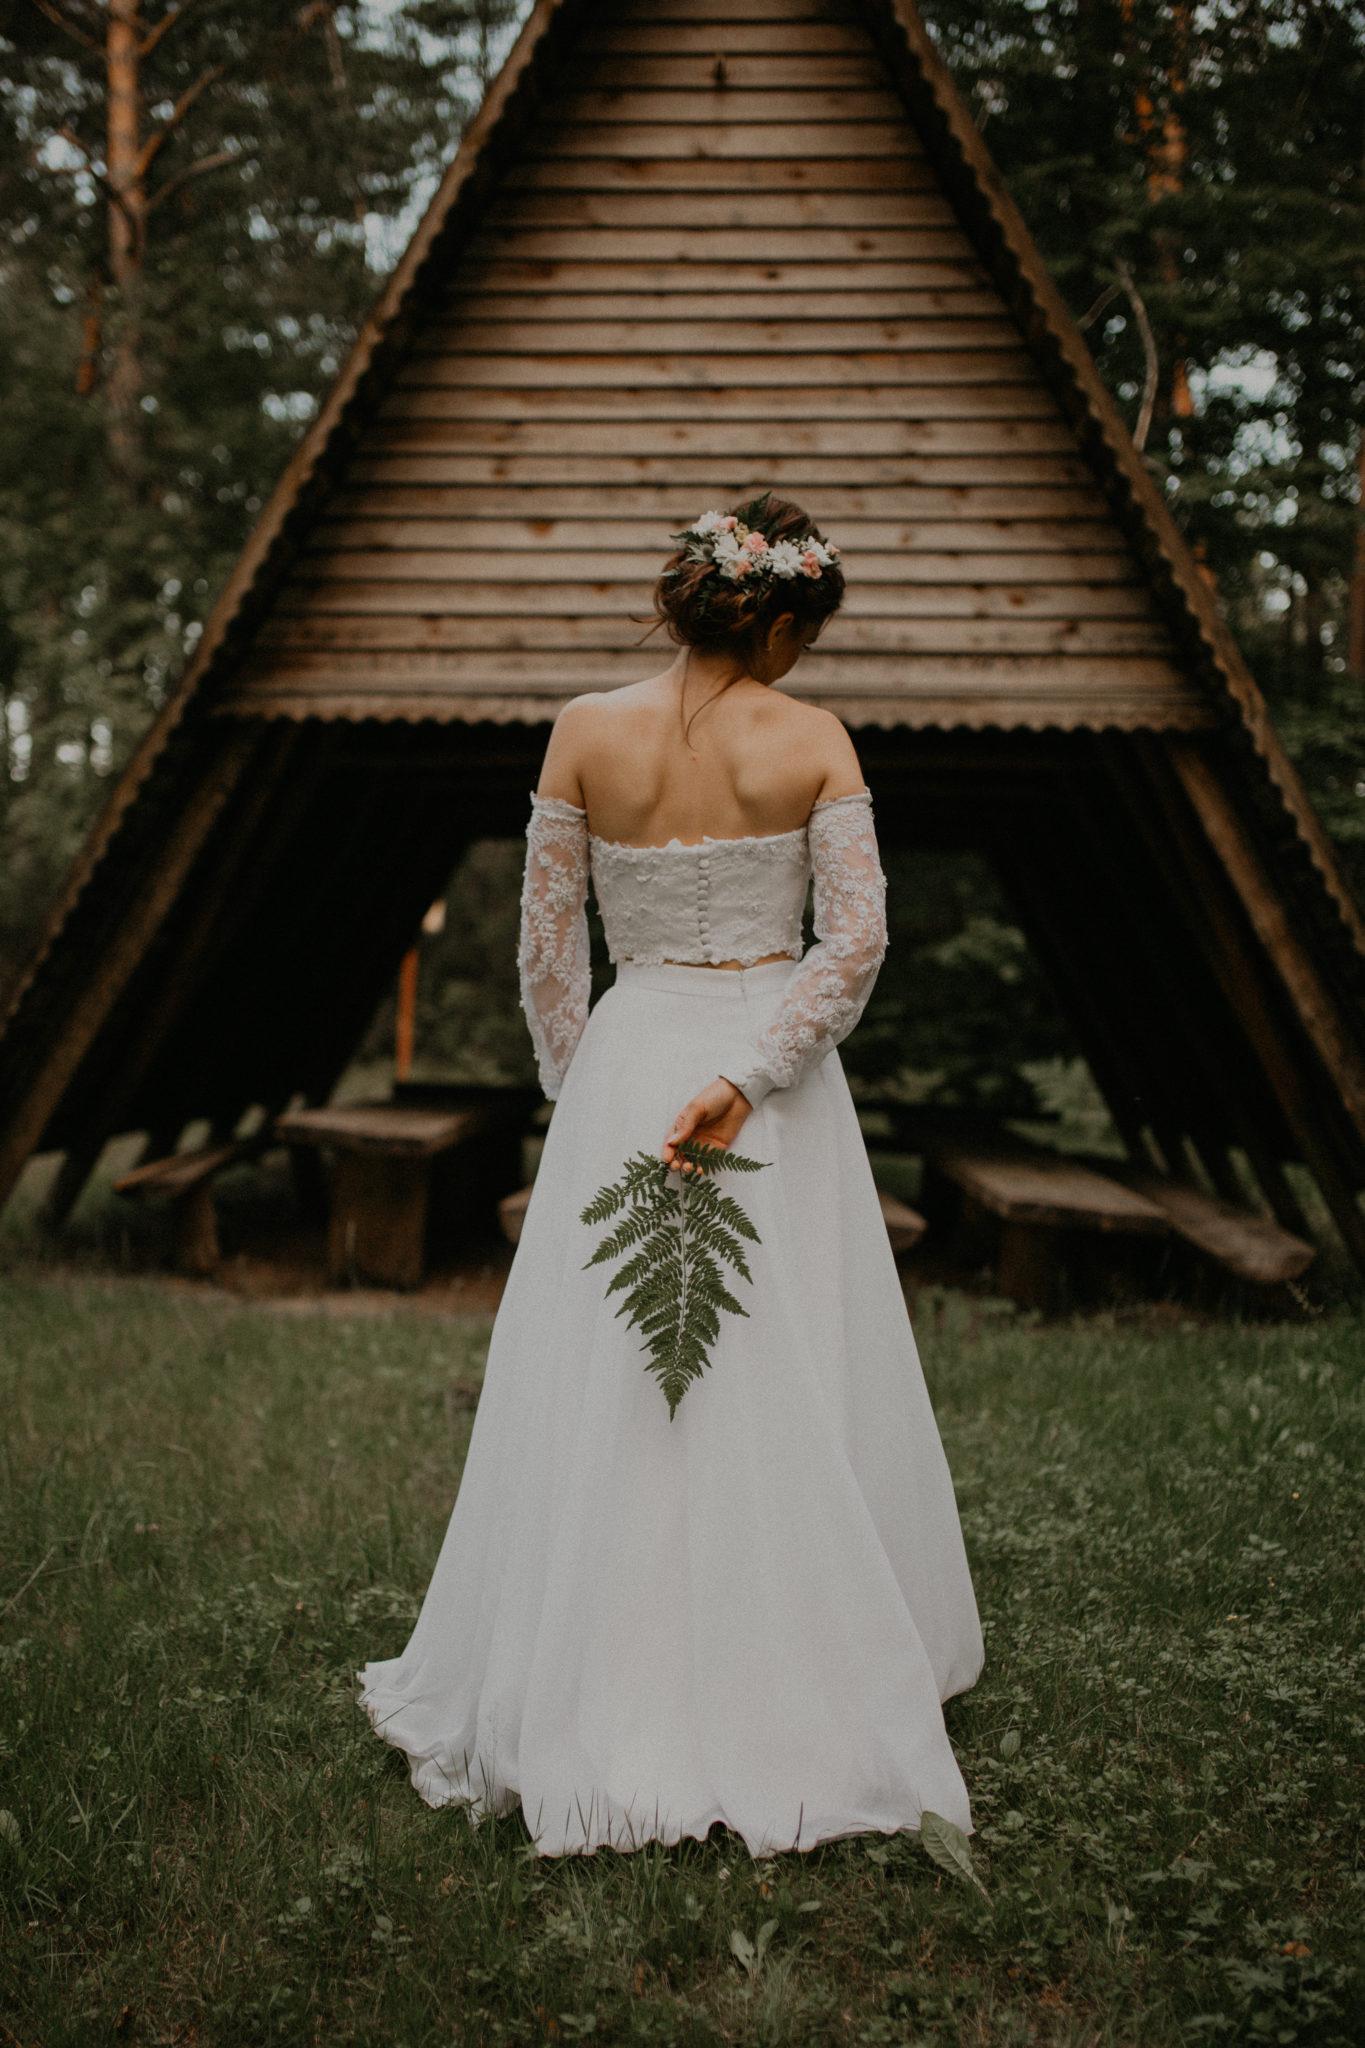 gosia i kubaplener 15 1 - fotografiagk Fotografia ślubna RK wedding